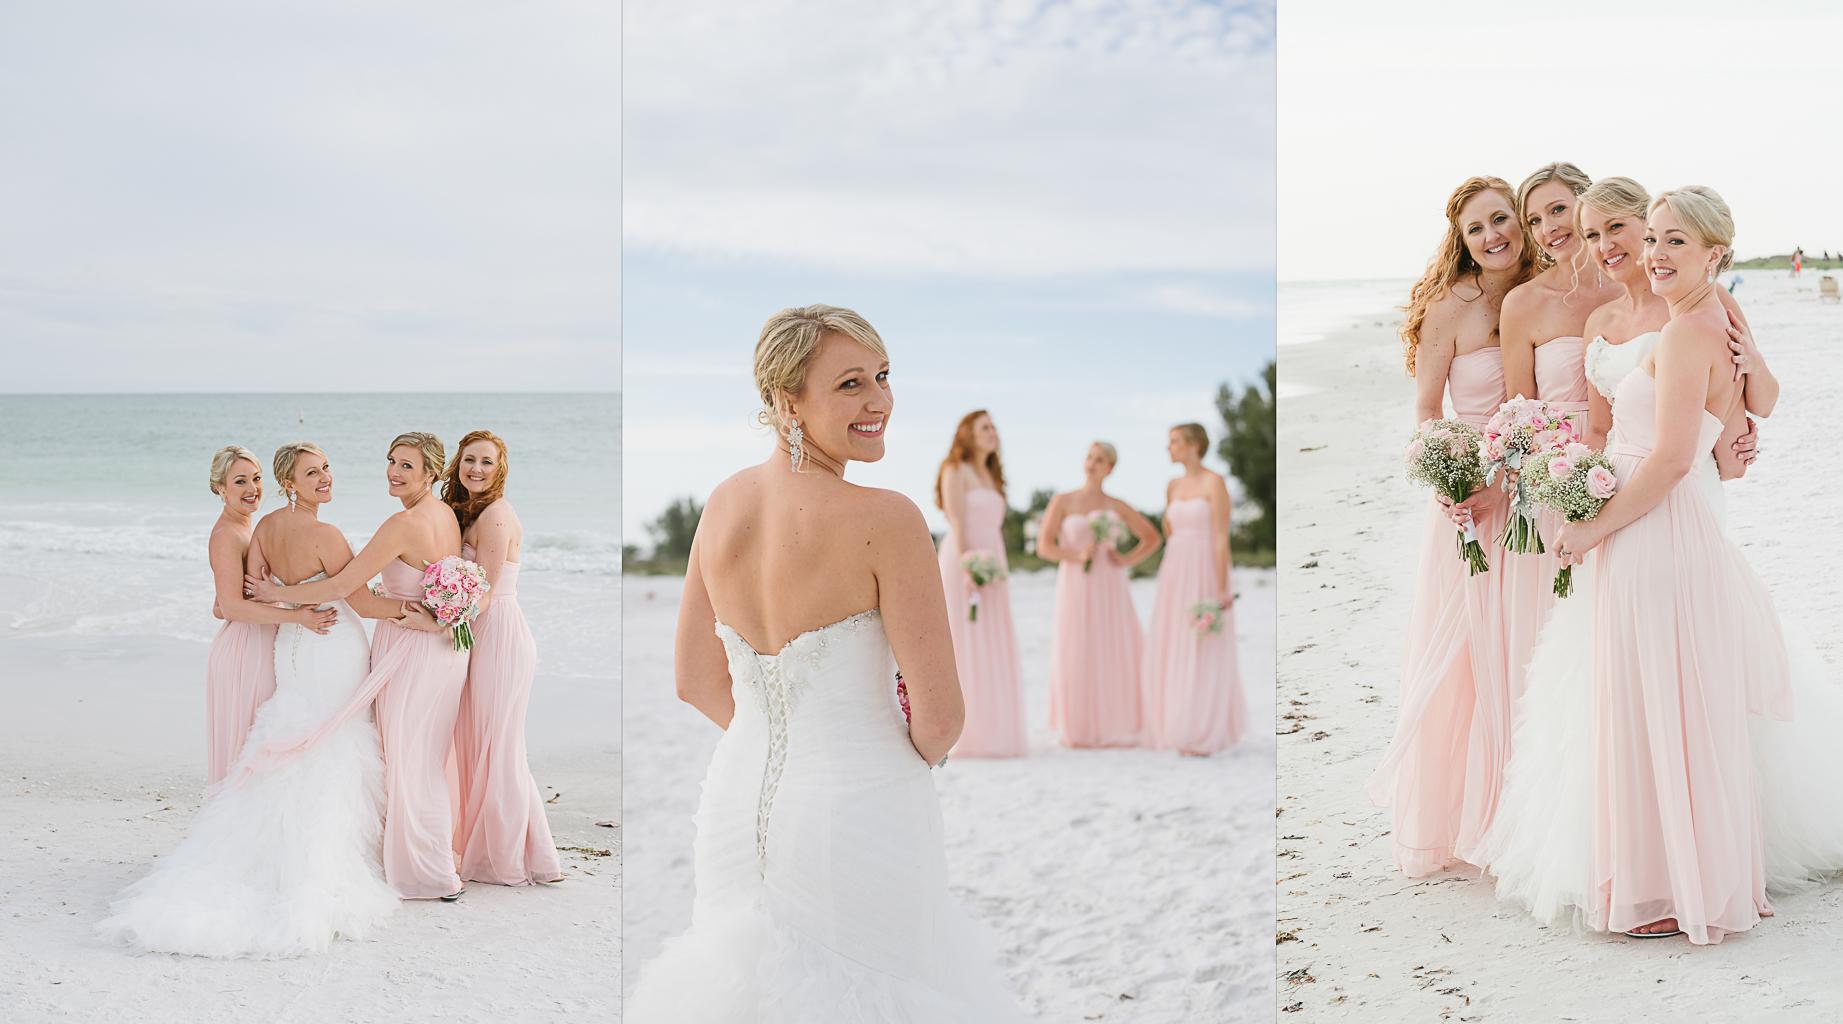 Anna Maria Island Florida Beach Wedding At Sandbar Restaurant